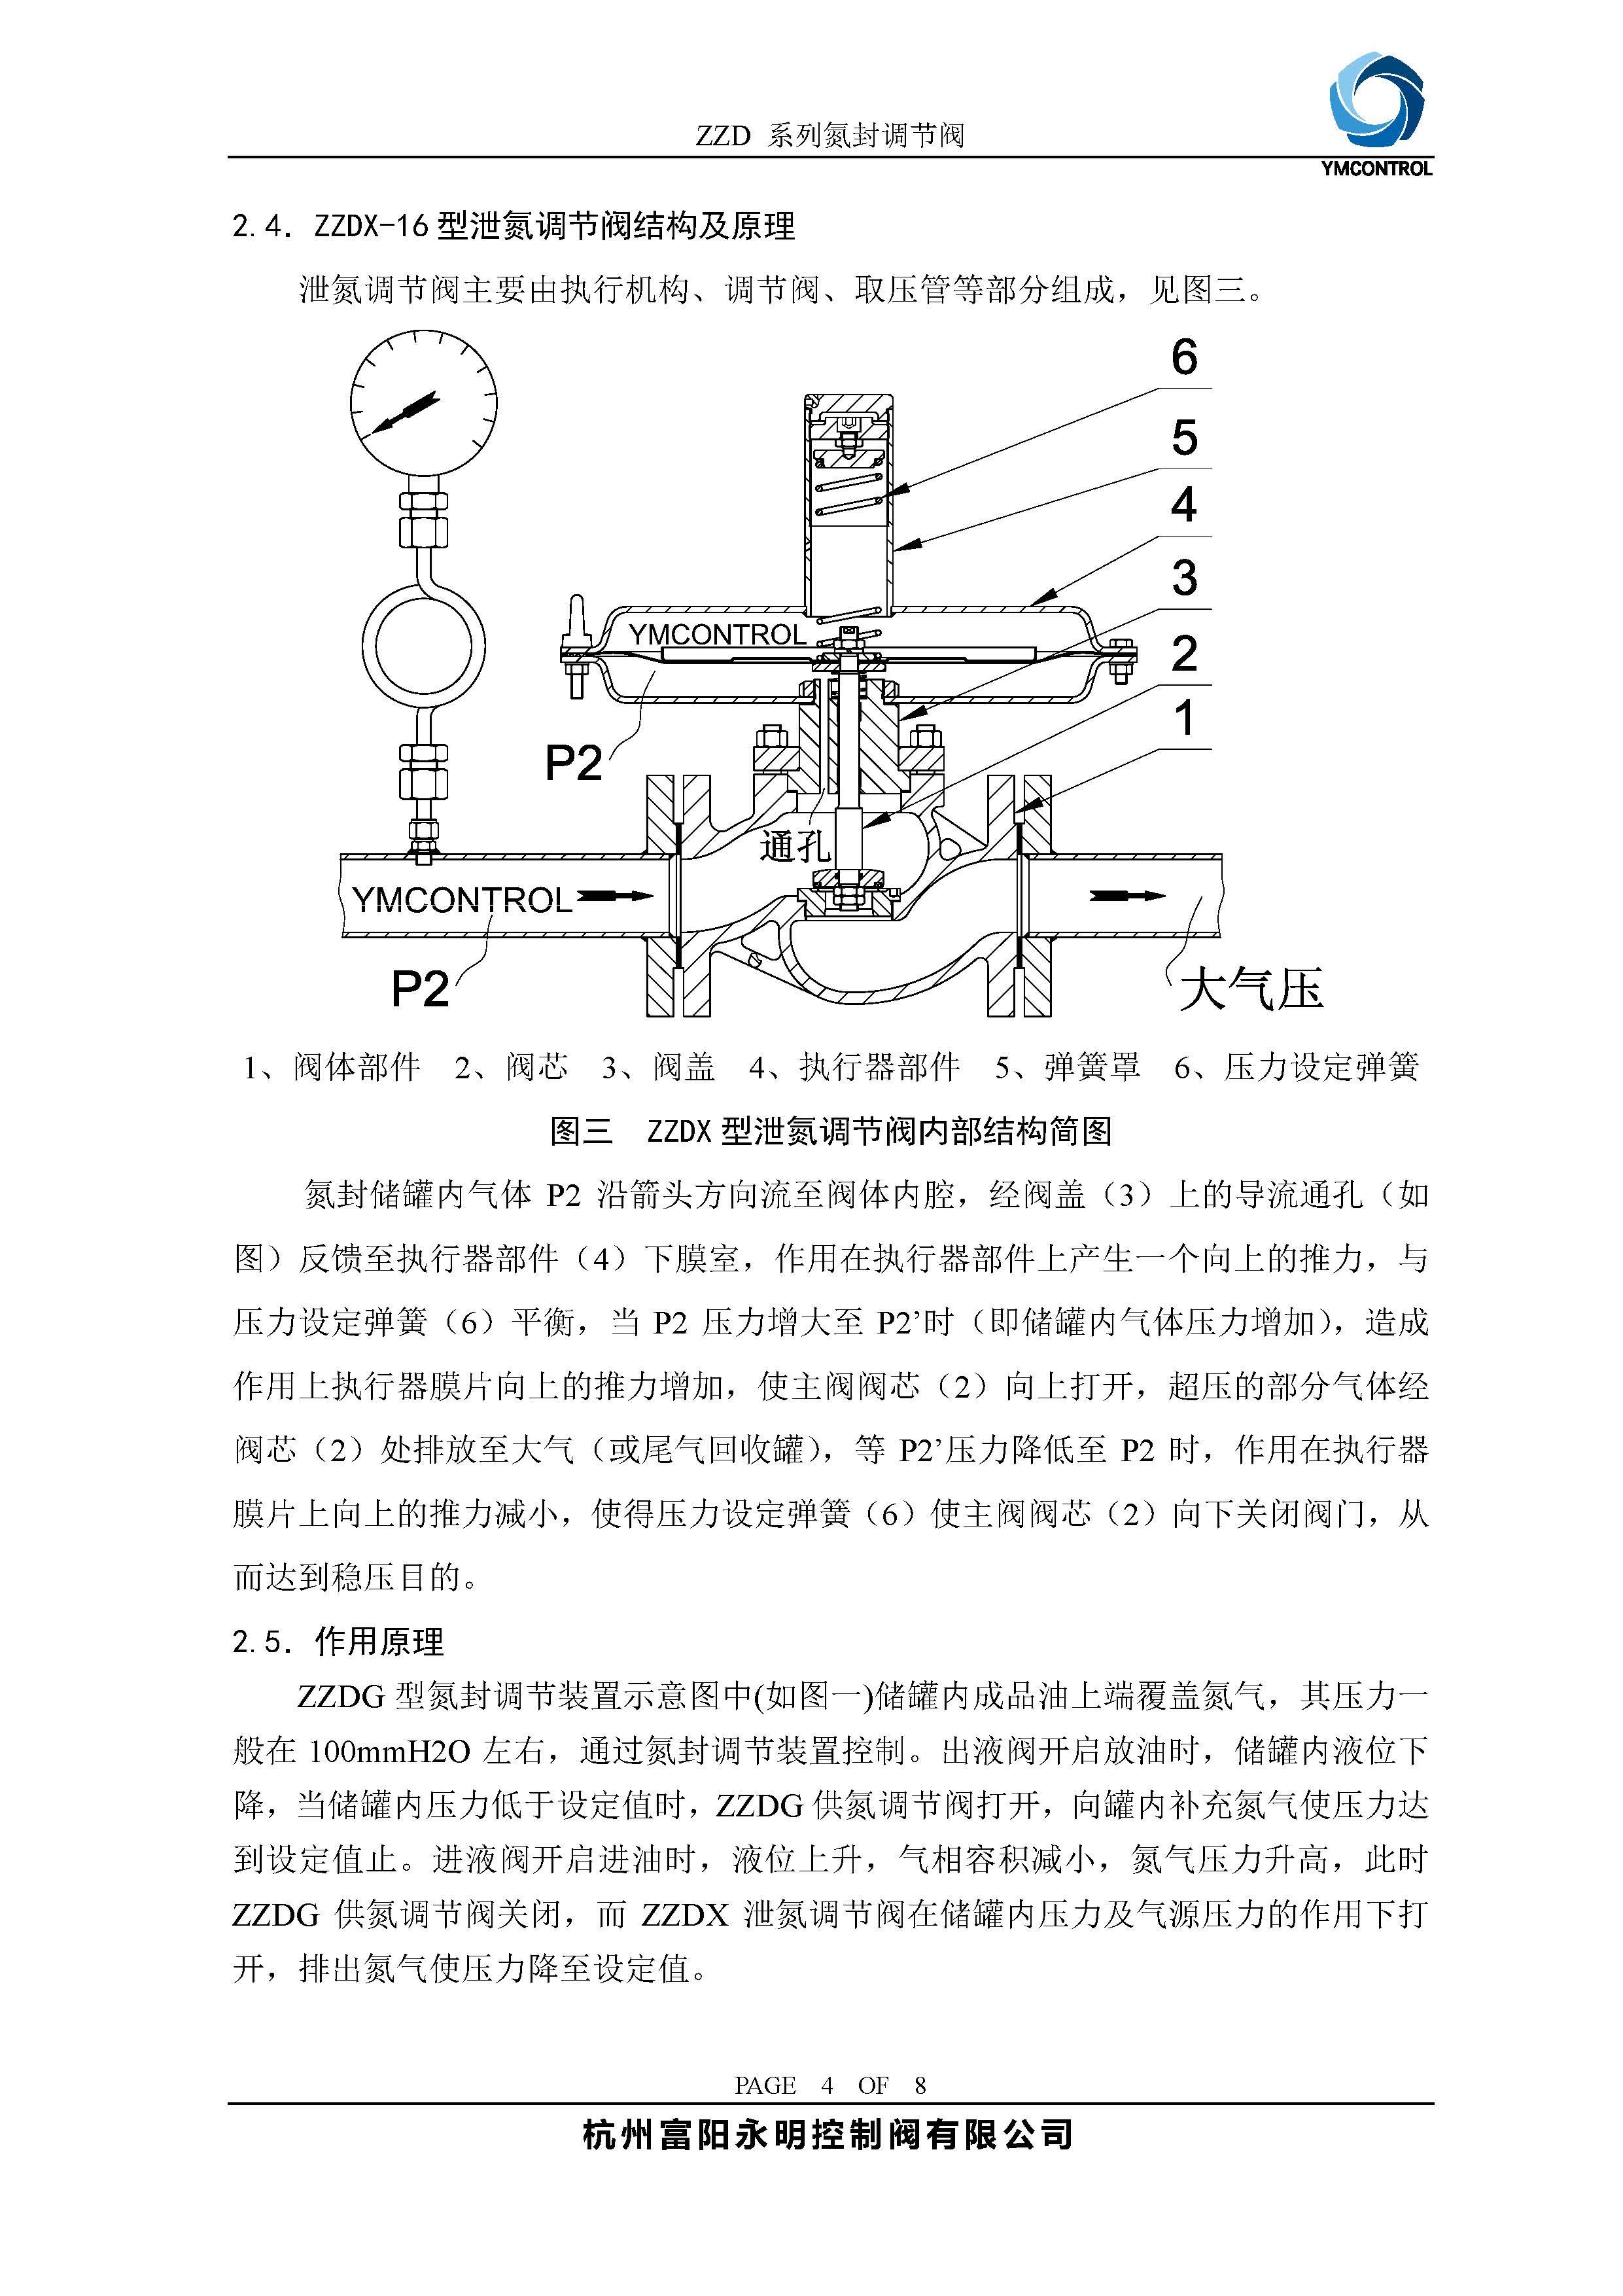 ZZD-ZZYVP帶指揮器儲罐供氮閥產品樣本說明書